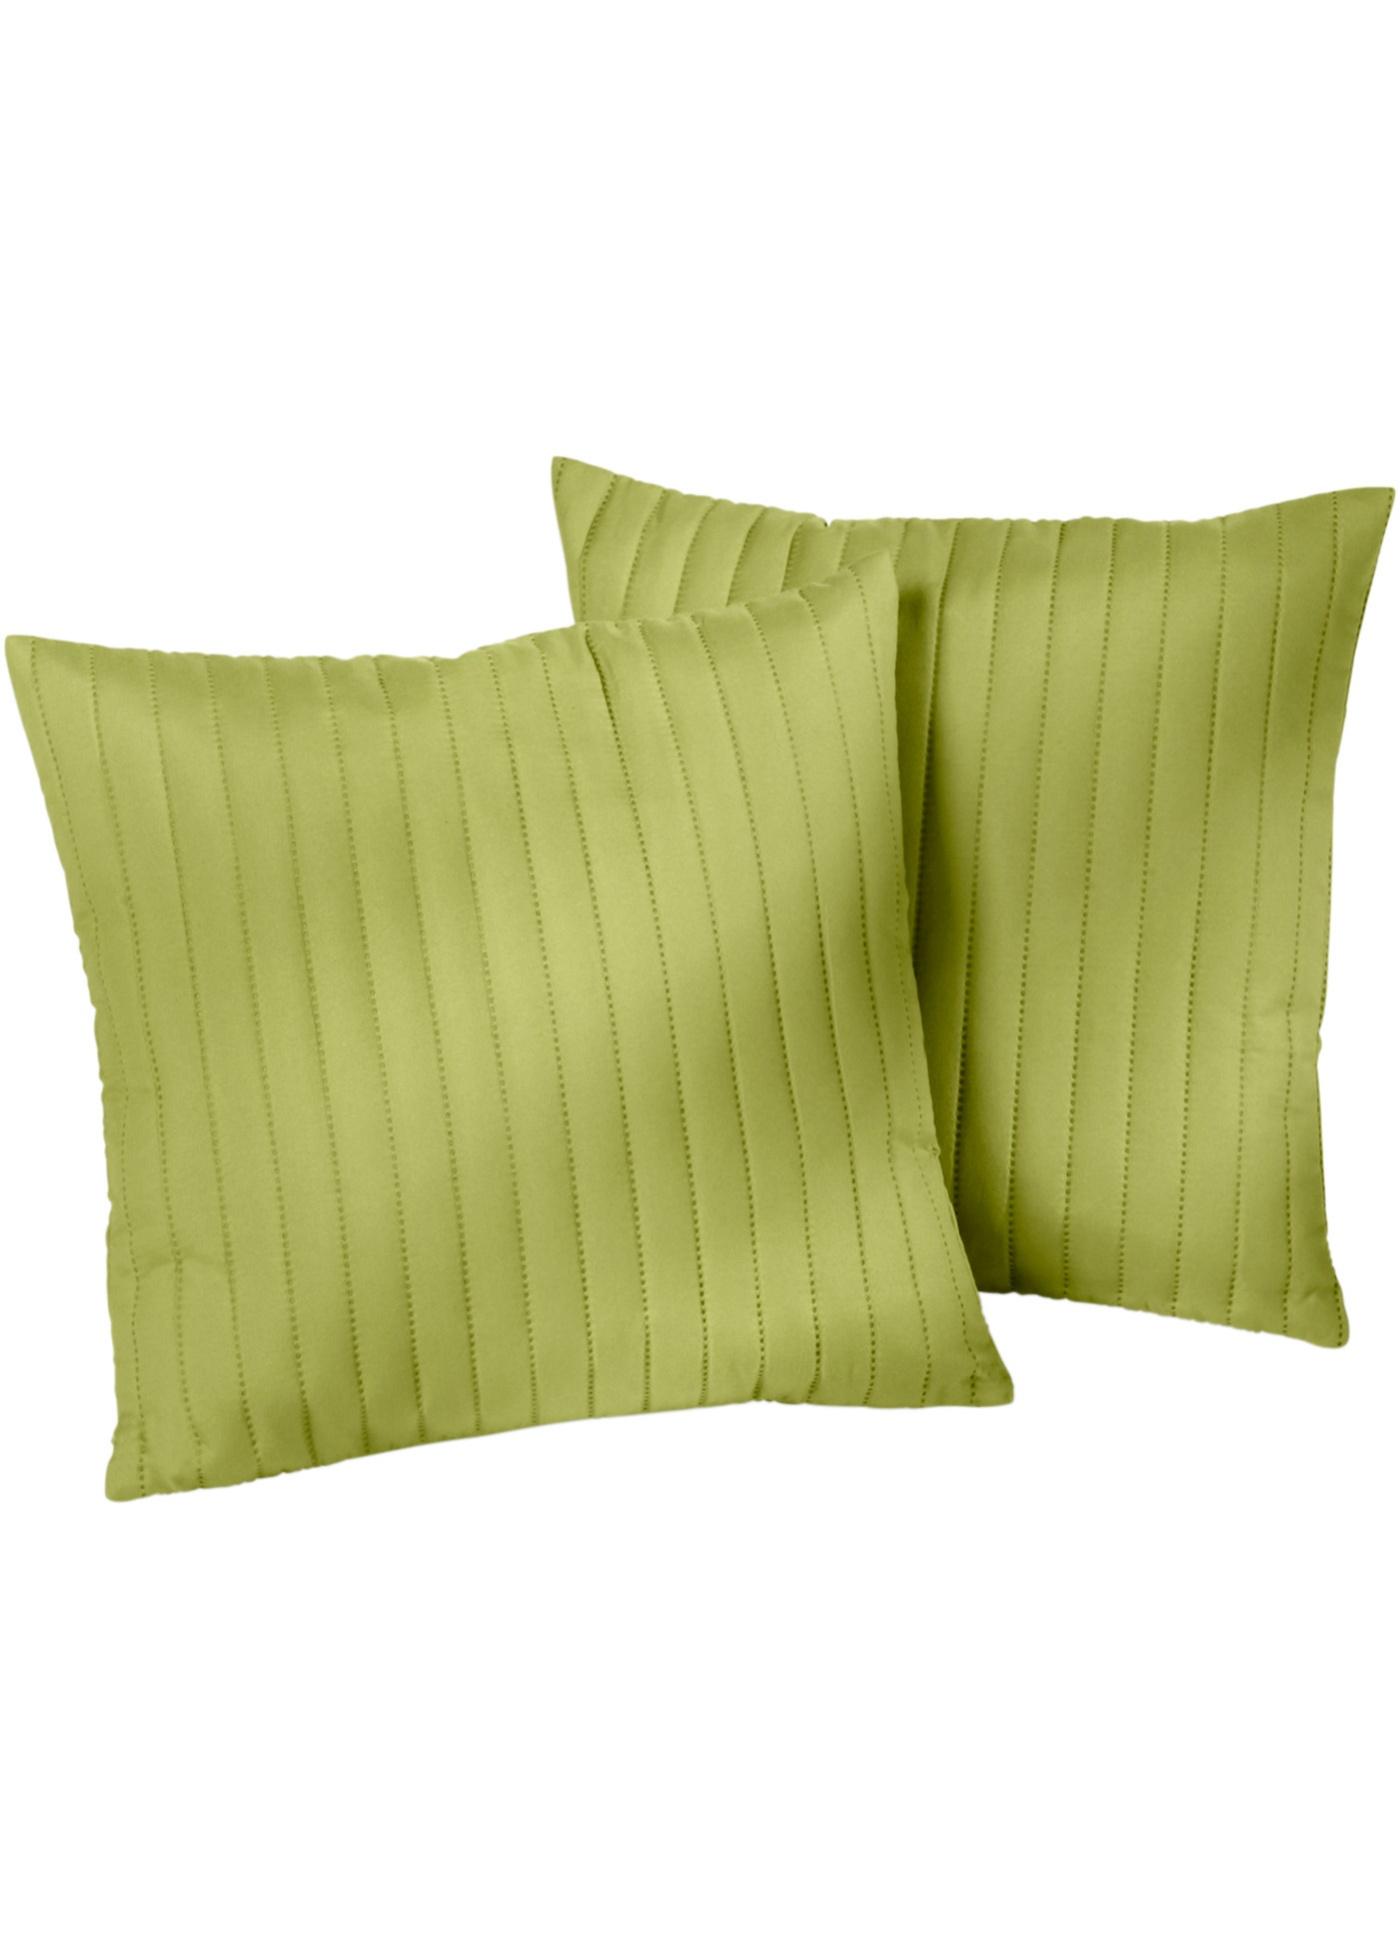 sofa berwurf gr n. Black Bedroom Furniture Sets. Home Design Ideas